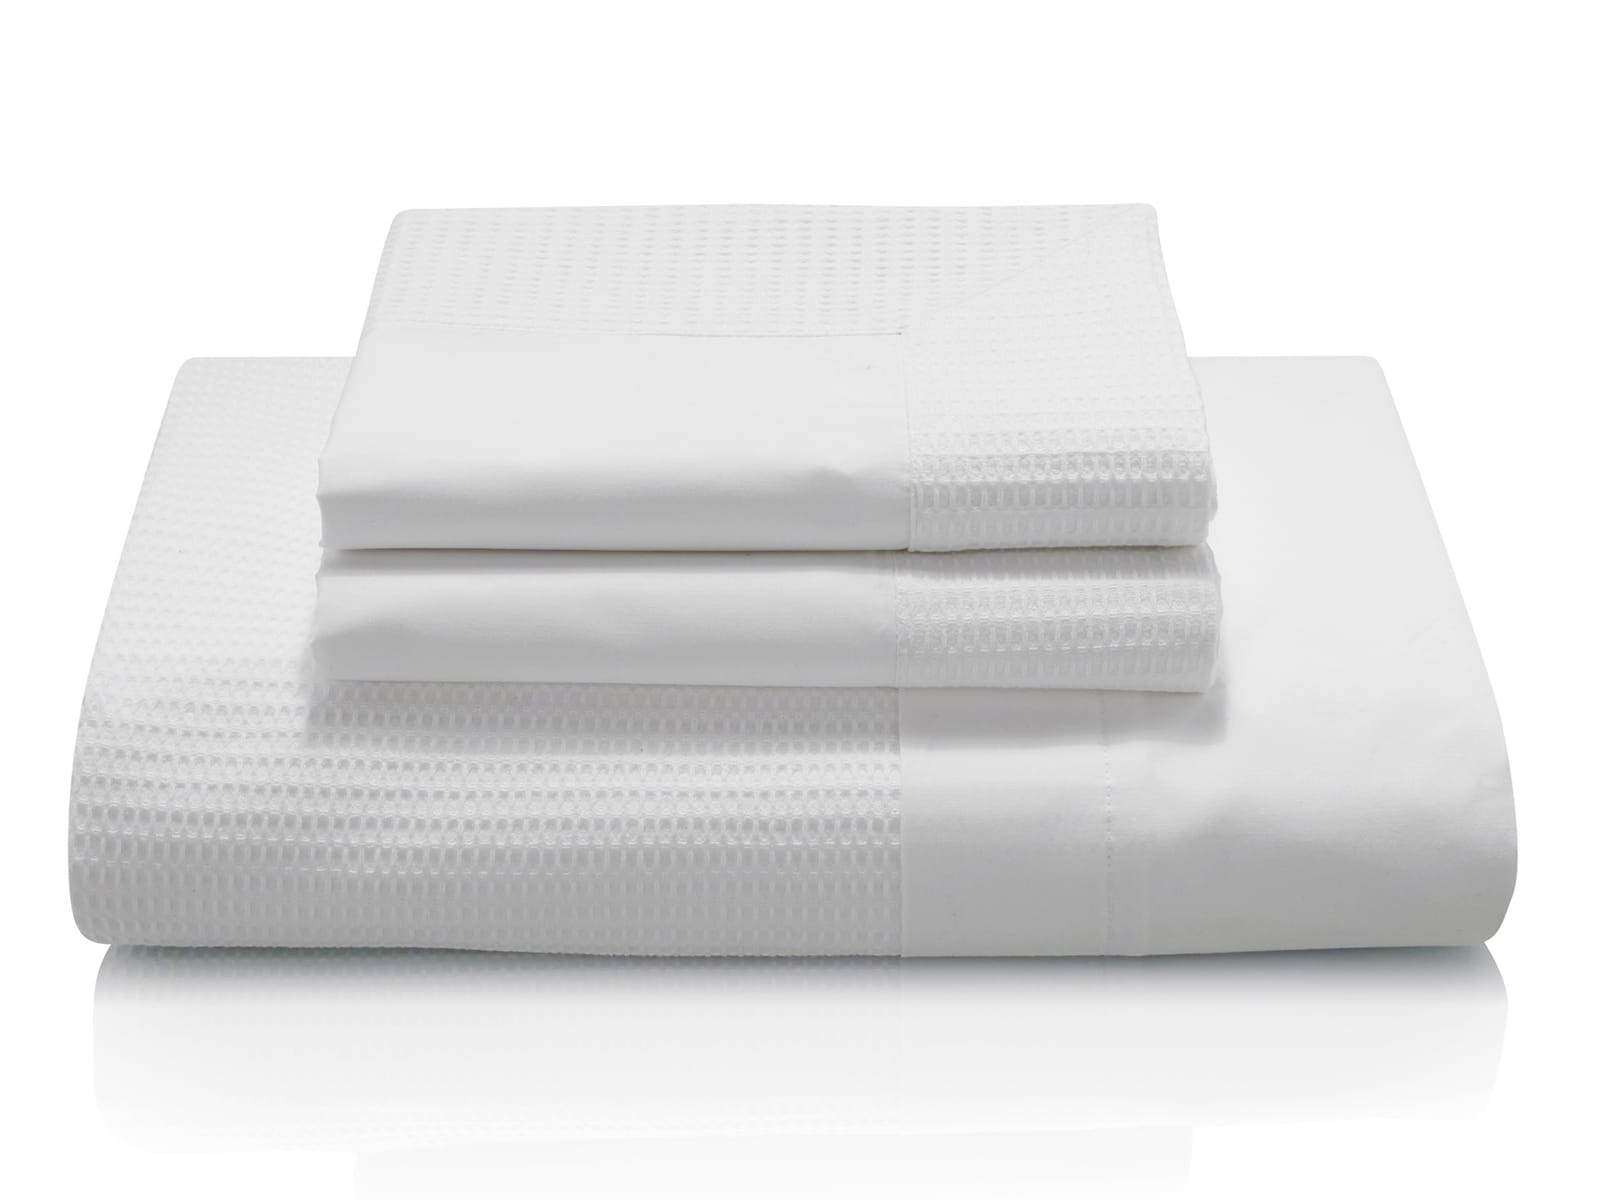 Complimentary linen. Nissan Primastar 2010